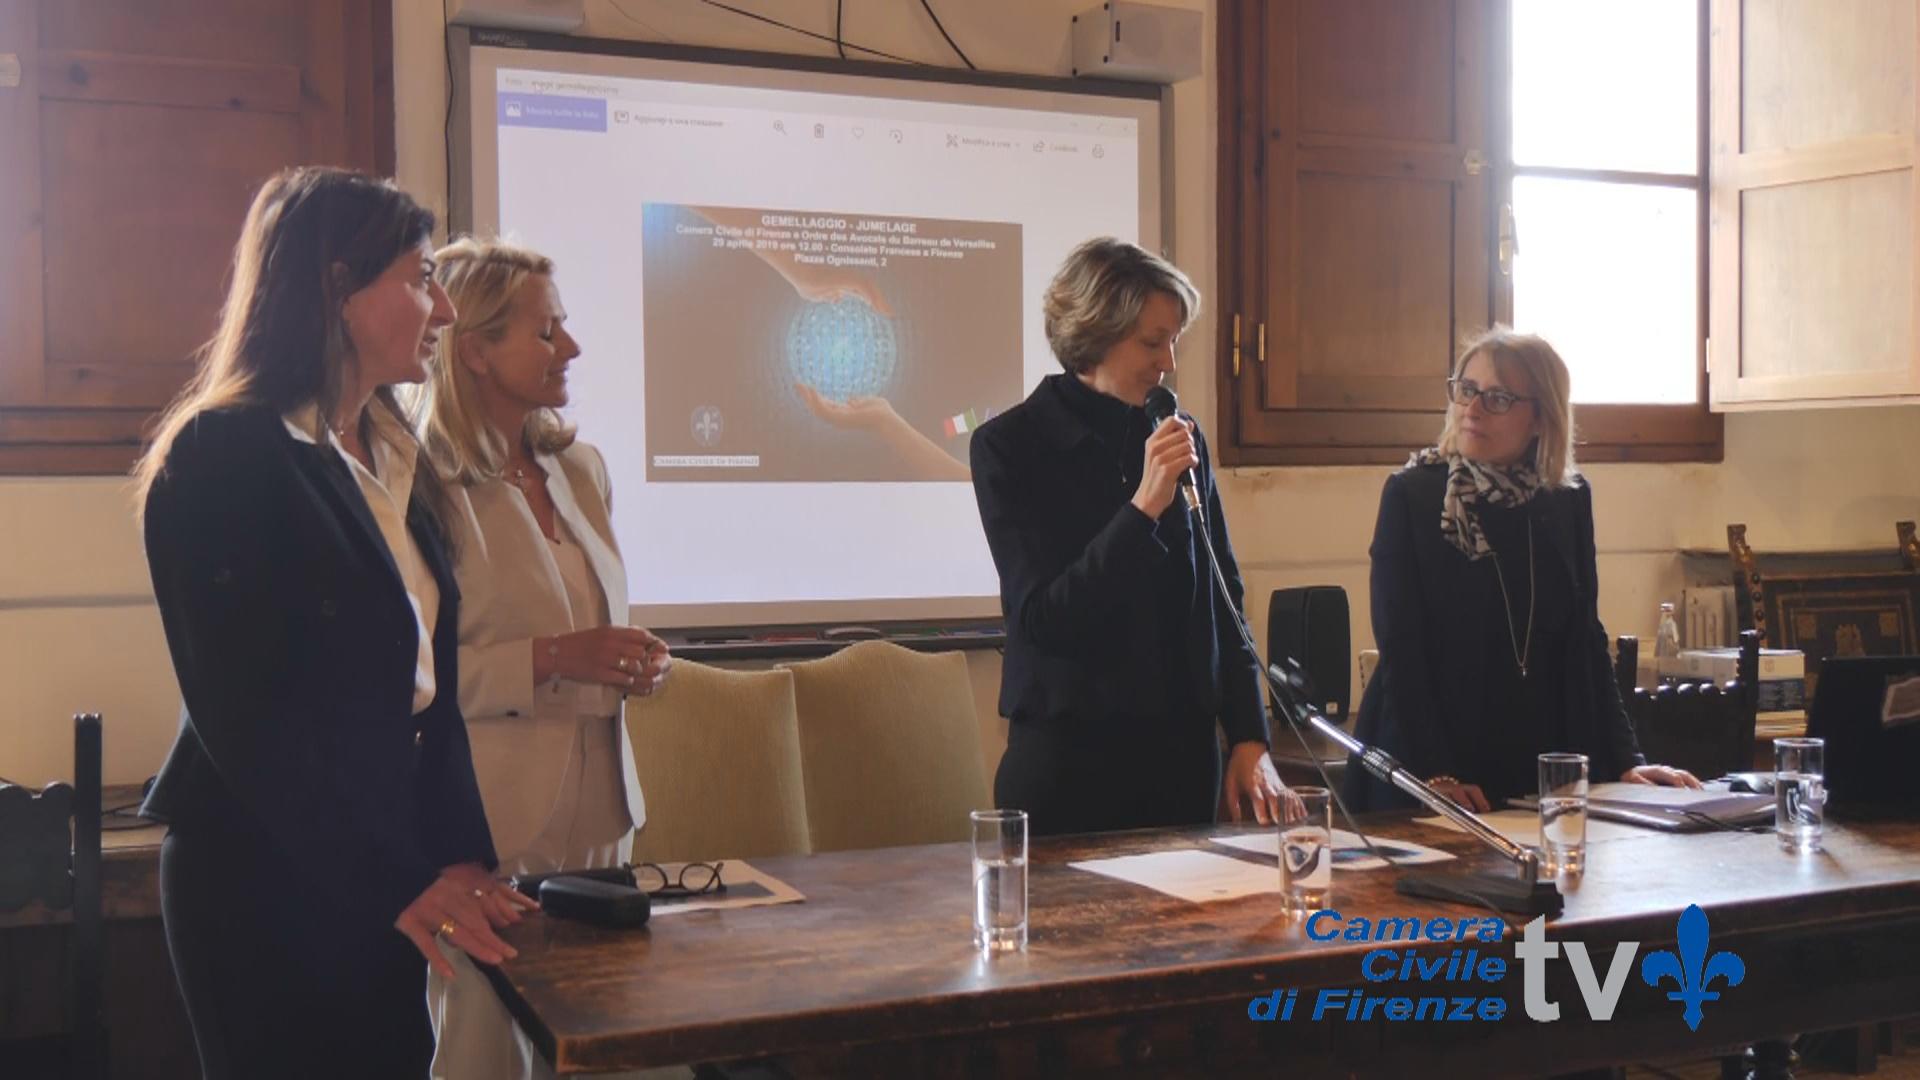 Convenzione di Gemellaggio tra la Camera Civile di Firenze e l'Ordre des Avocats du Barreau de Versailles